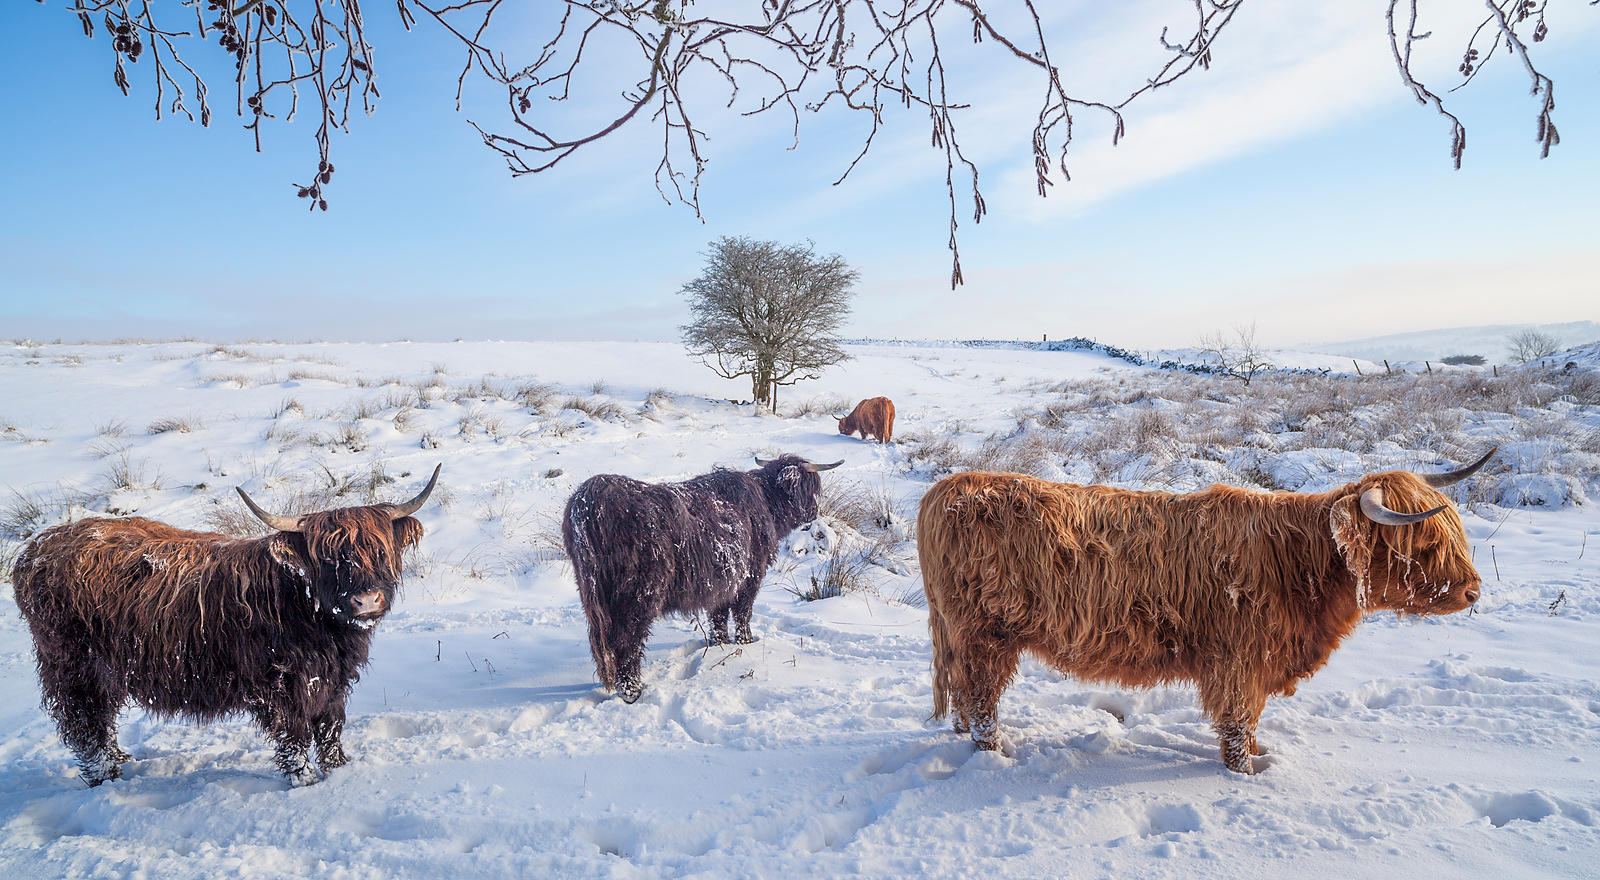 * Highland cattle in snow on Curbar Edge | Peak District ... - photo#17